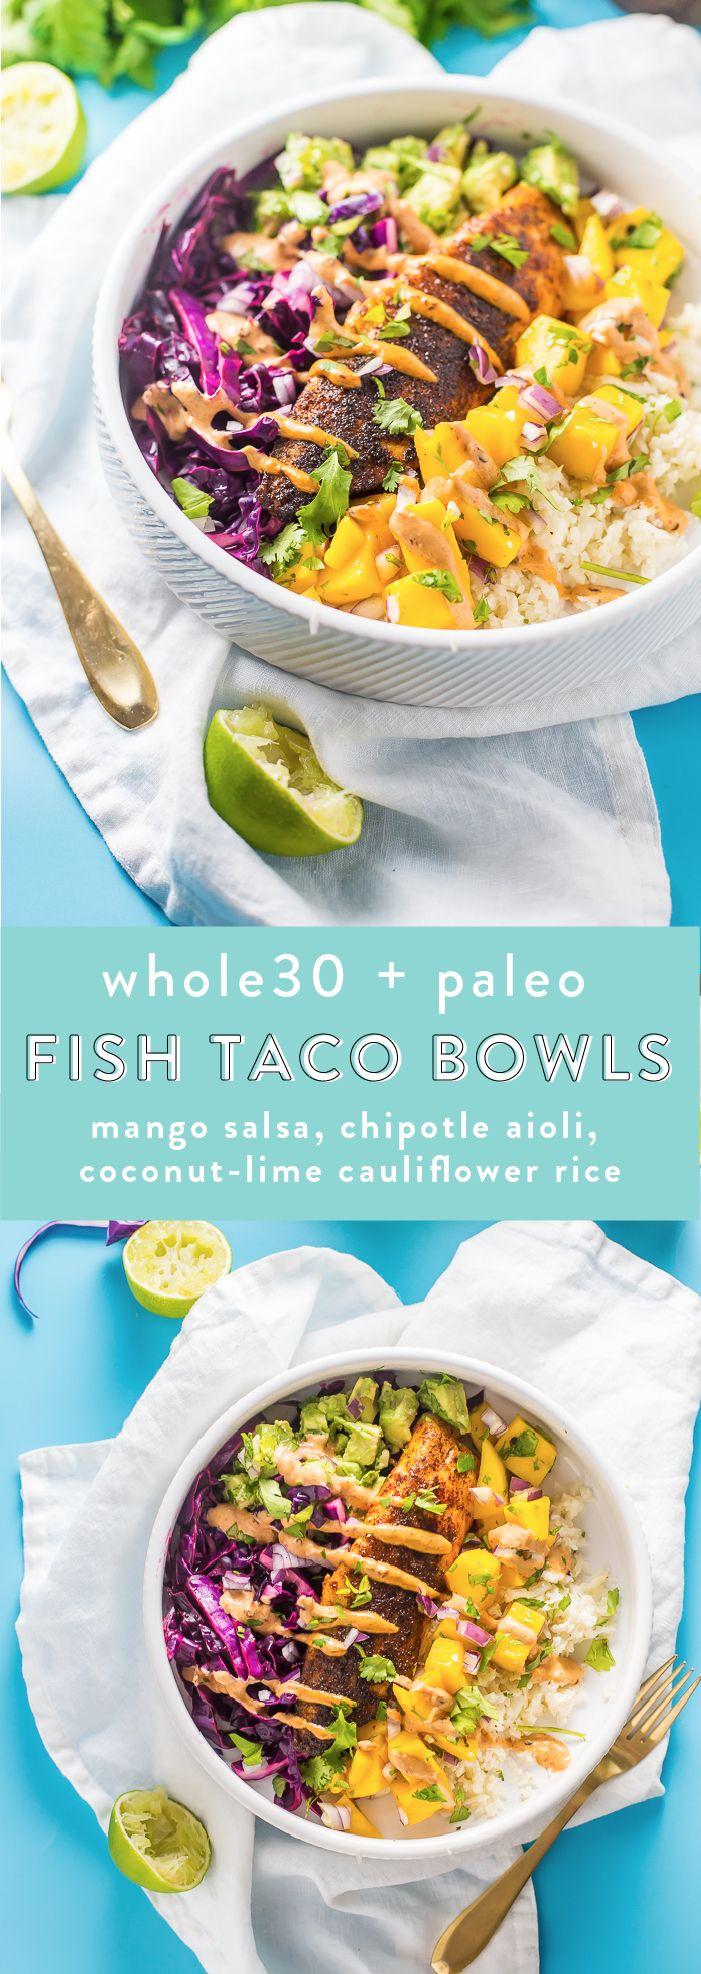 Whole30 Paleo Fish Taco Bowls with Mango Salsa, Chipotle Aioli, Coconut Lime Cauliflower Rice | 40 Aprons